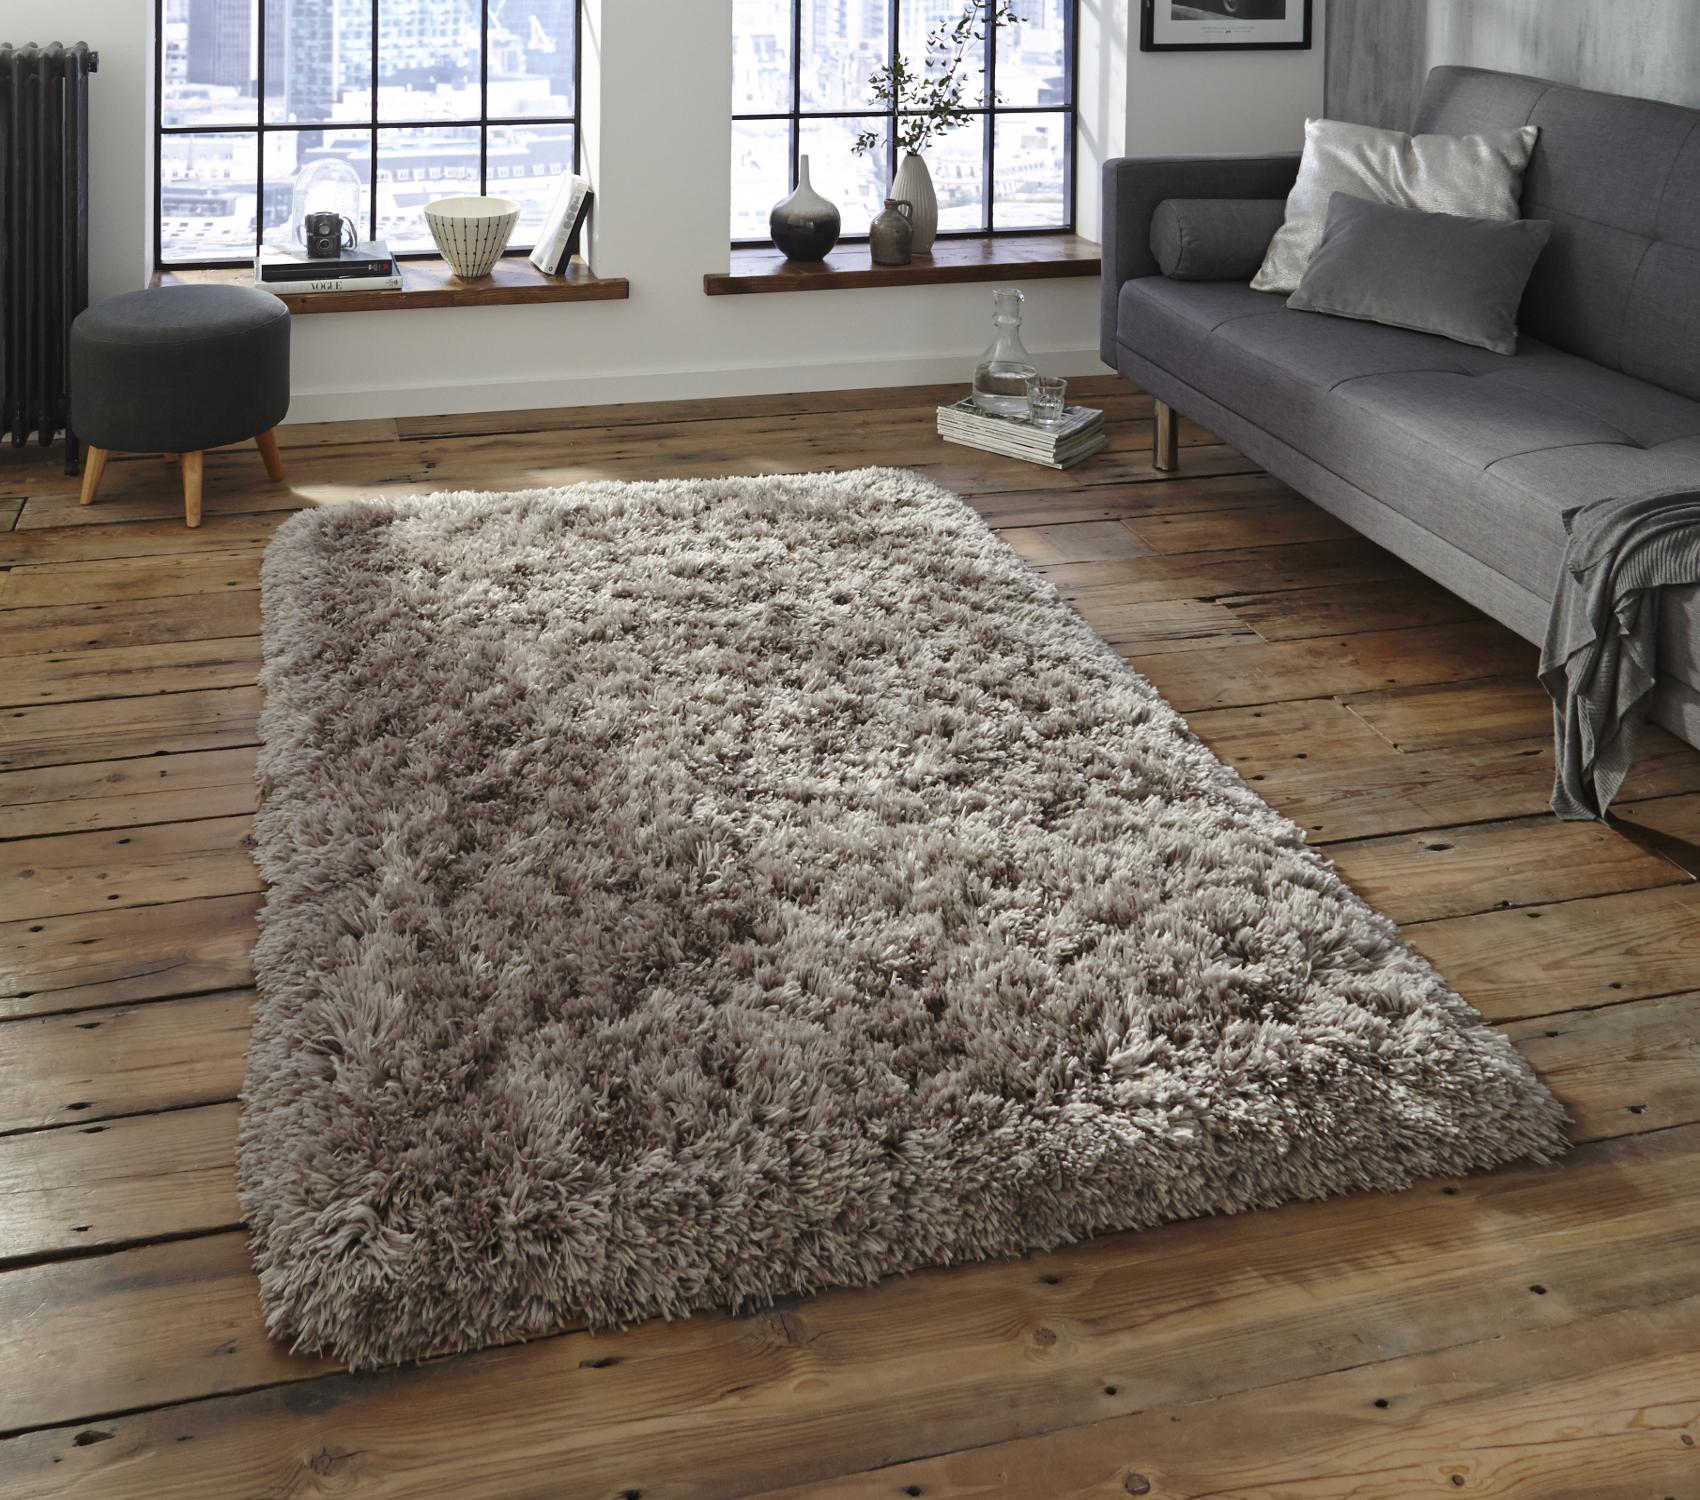 Super Soft Plush Area Rugs Shapeyourminds Com